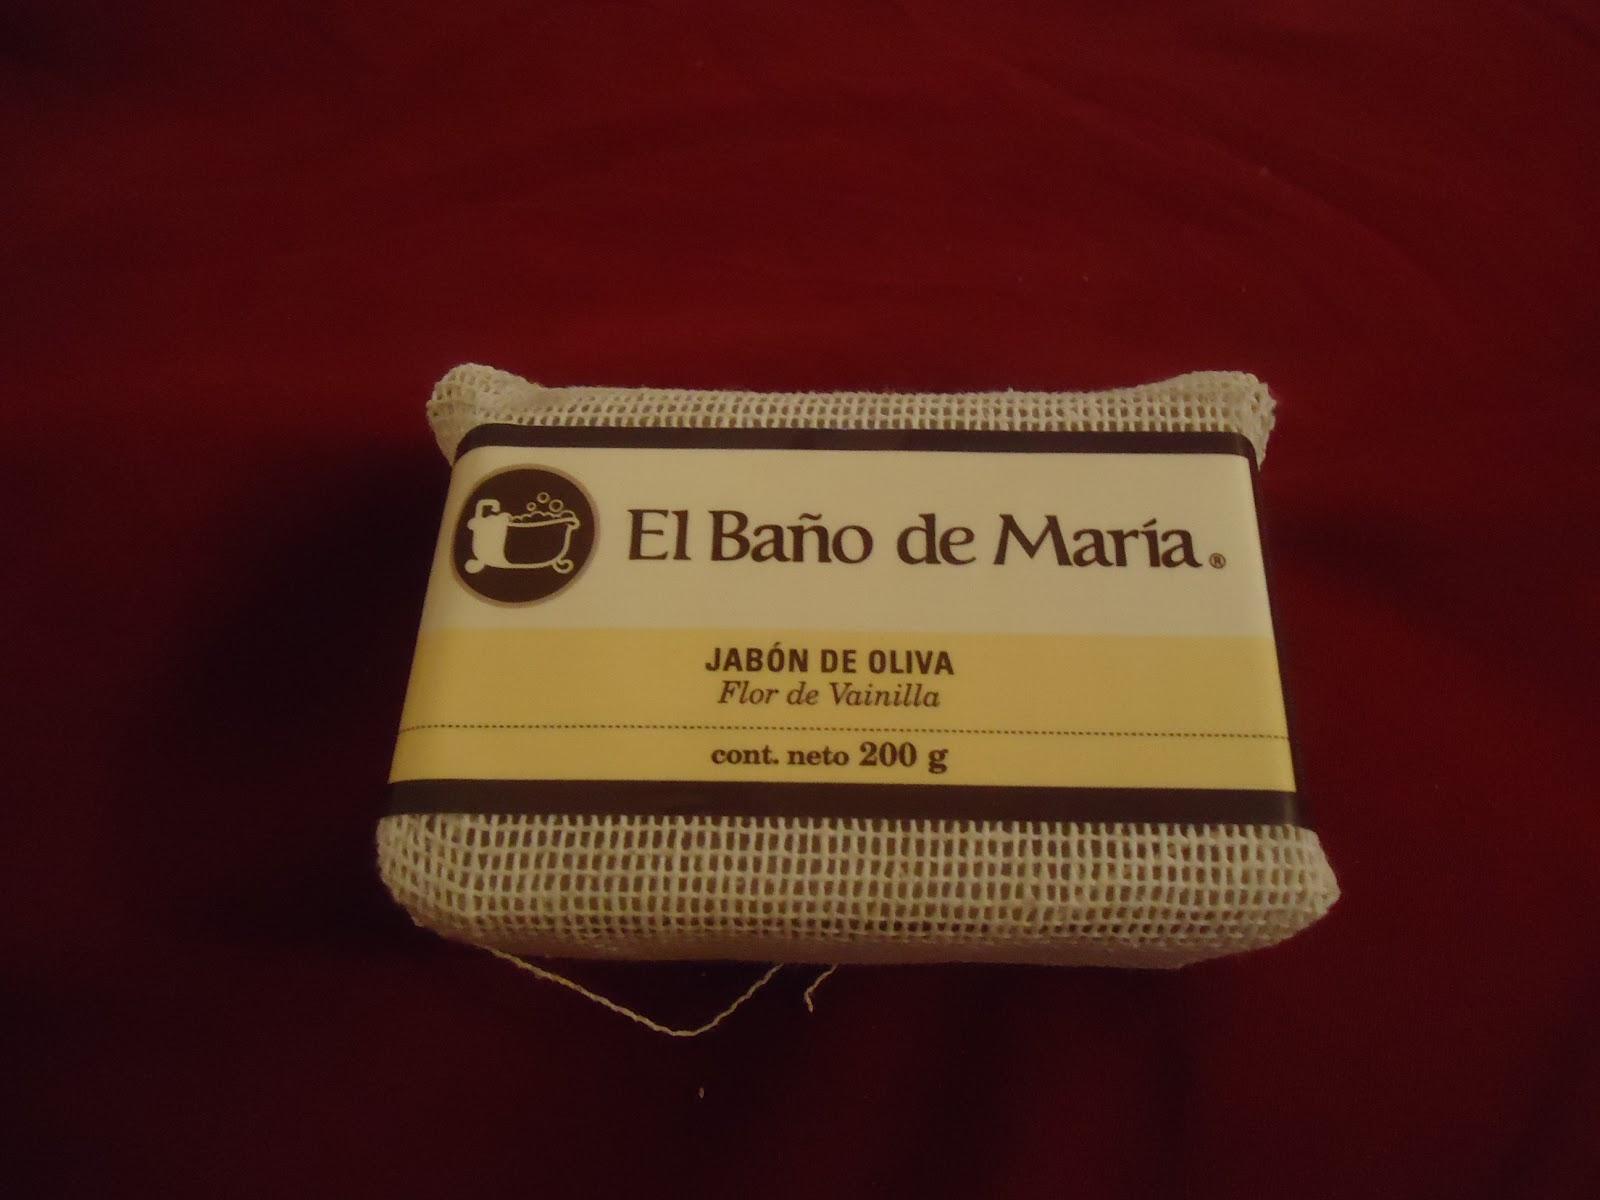 Imagenes De Jabon De Baño:ADICTA AL RUBOR: Jabon de Flor de Vainilla del el Baño de Maria